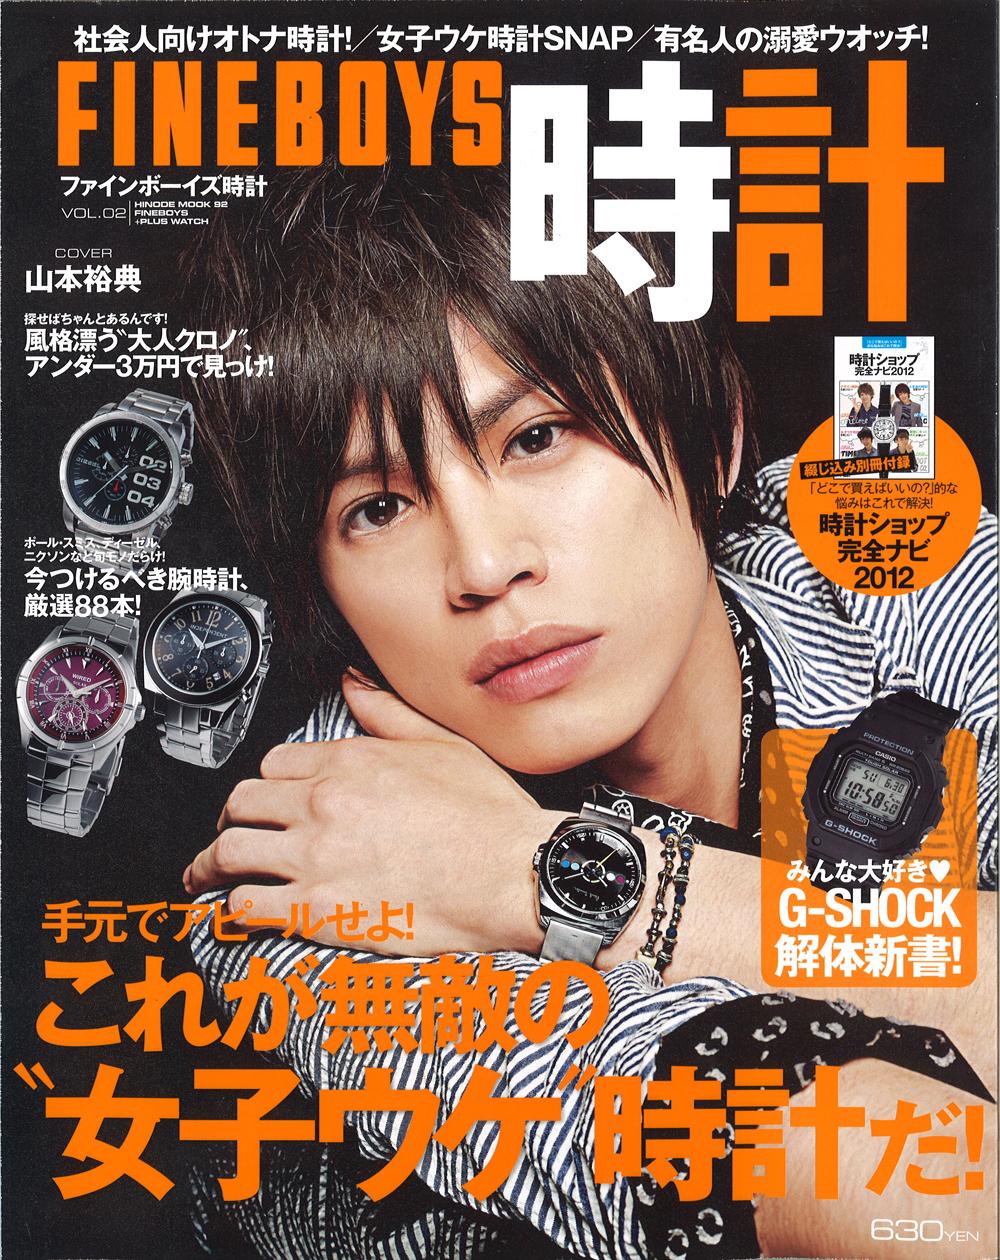 FONEBOYS時計2012年6月号表紙